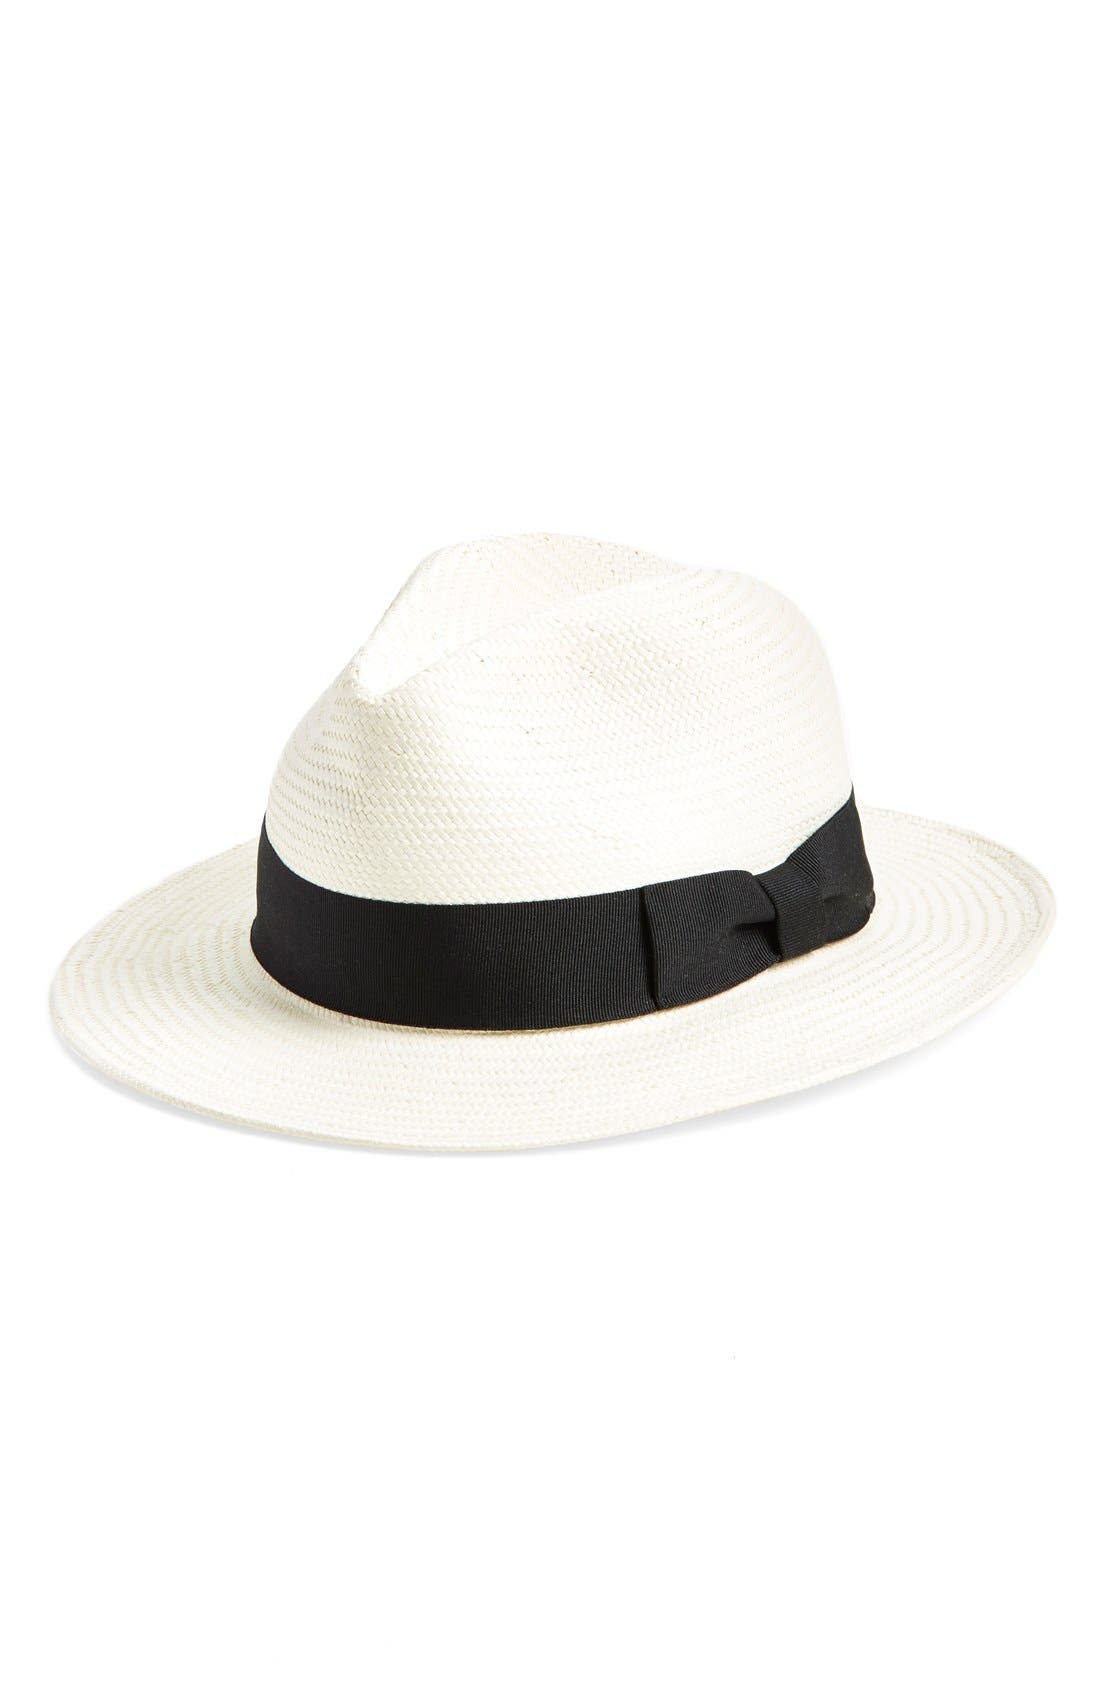 MADEWELL, Panama Hat, Alternate thumbnail 6, color, 250